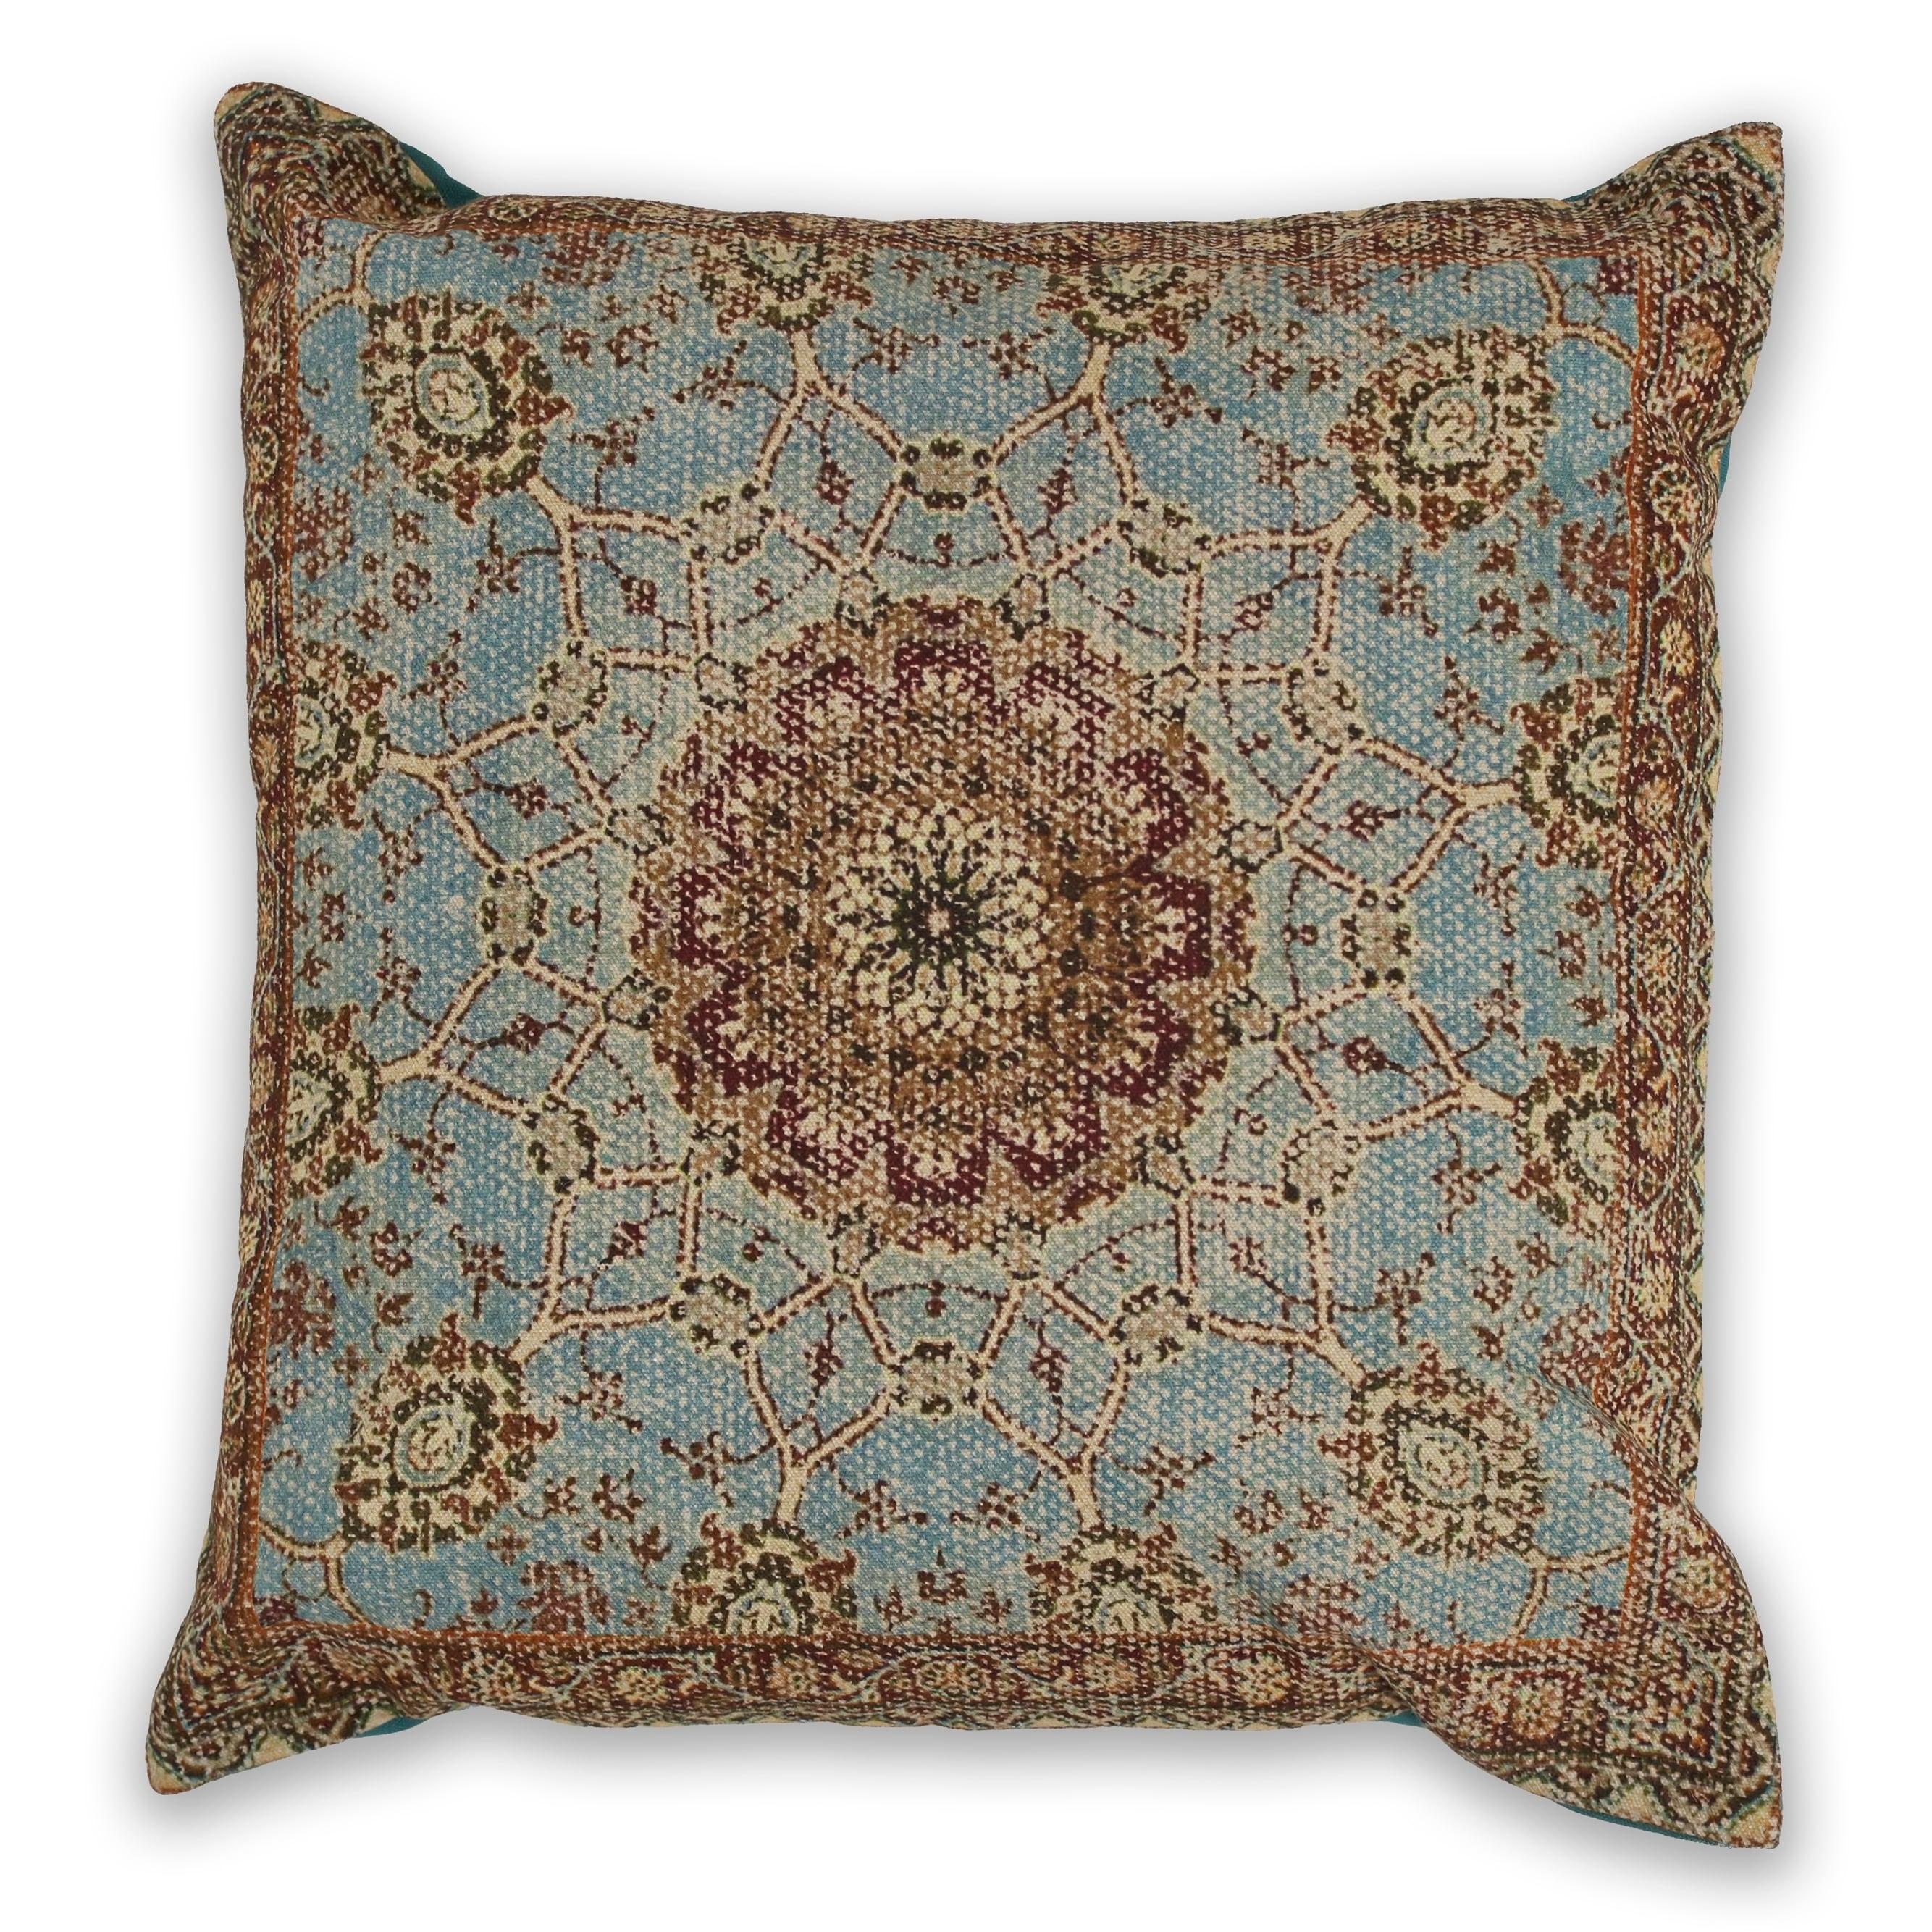 Kas Blue Morocco Decorative Throw Pillow Overstock 22824331